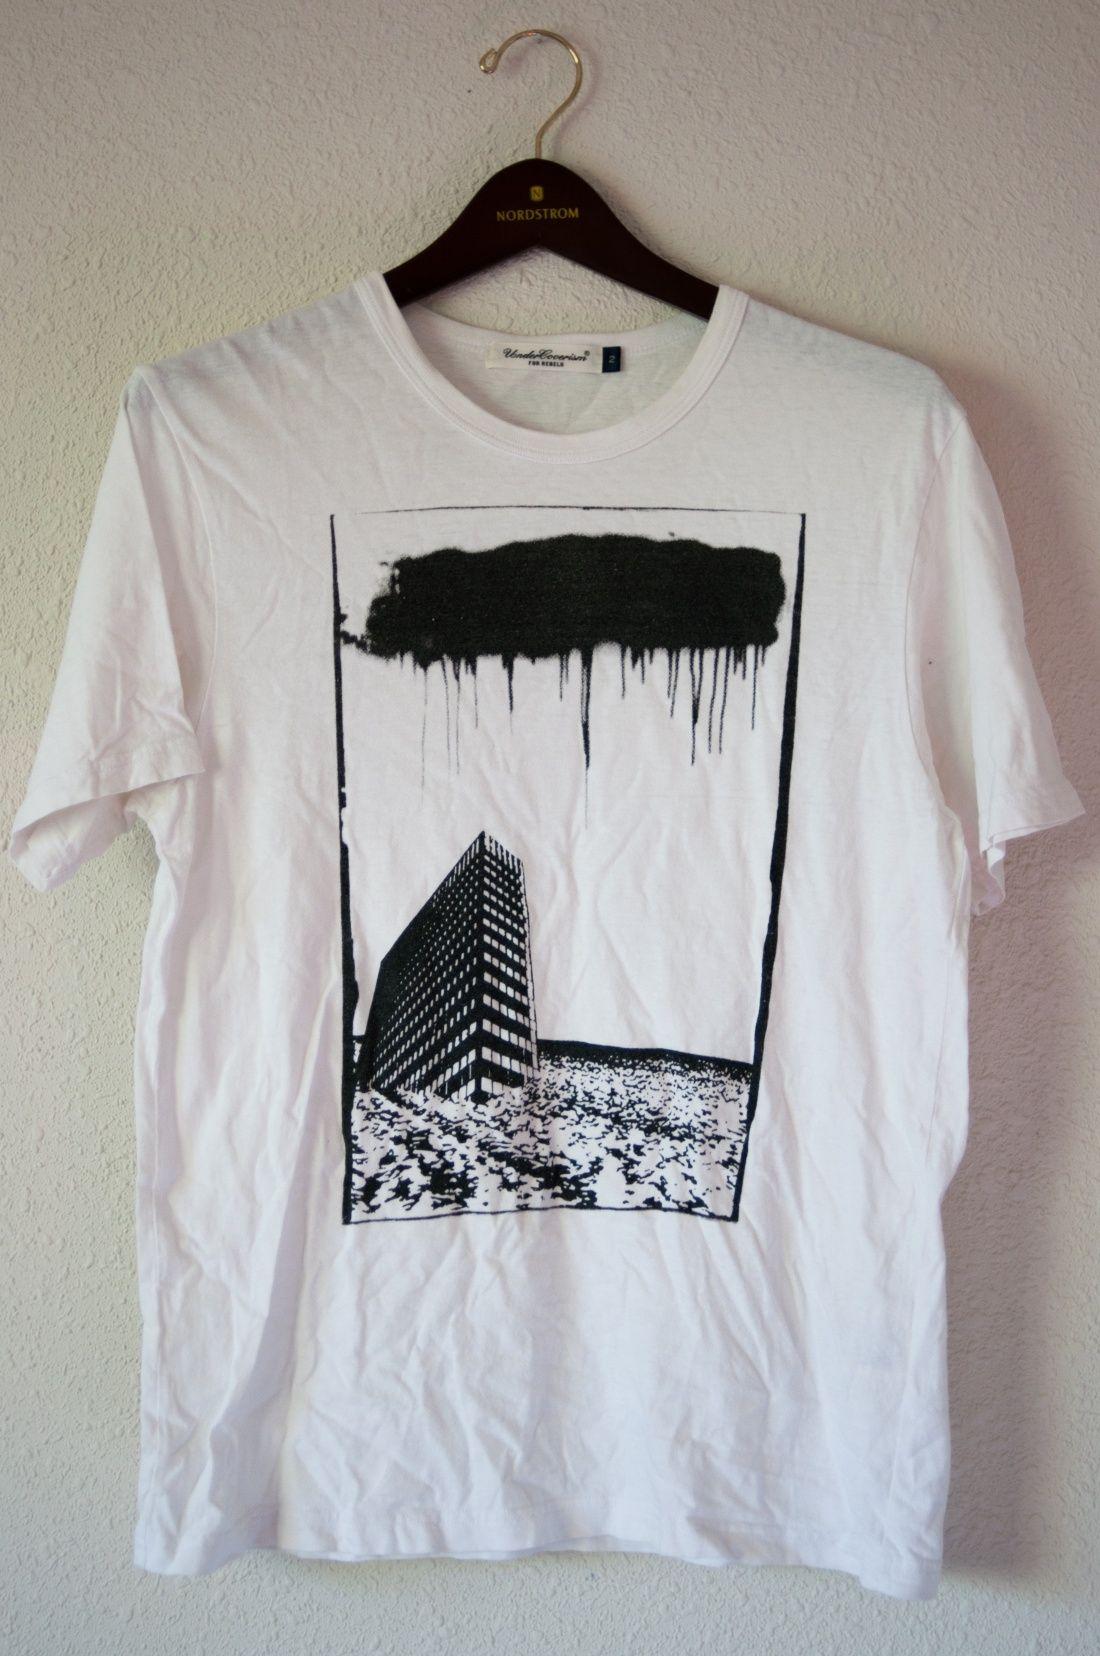 97fb0bda87ba Gloomy city t-shirt | Clothing/Fashion Graphics | Shirts, T shirt ...